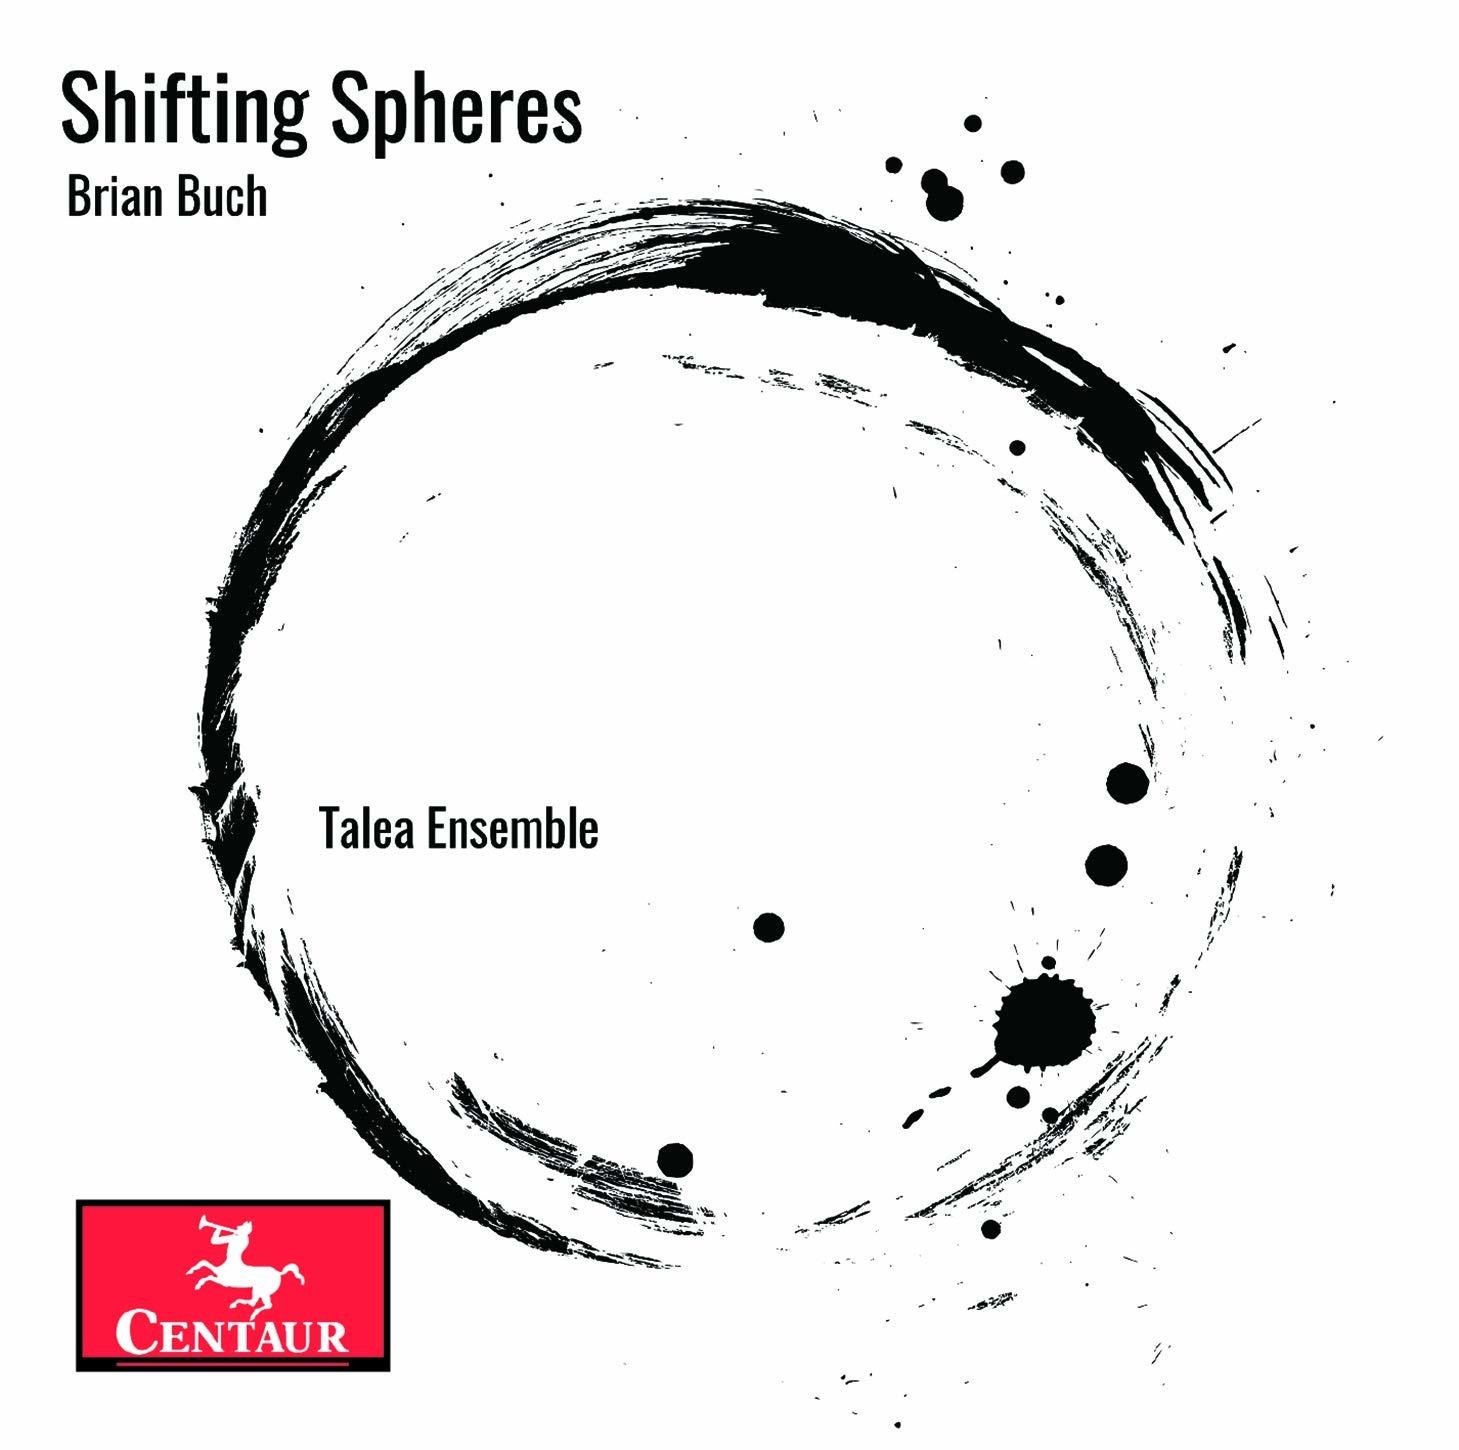 Shifting Spheres - Buch / Talea Ensemble - Musik -  - 0044747383125 - 2/10-2020